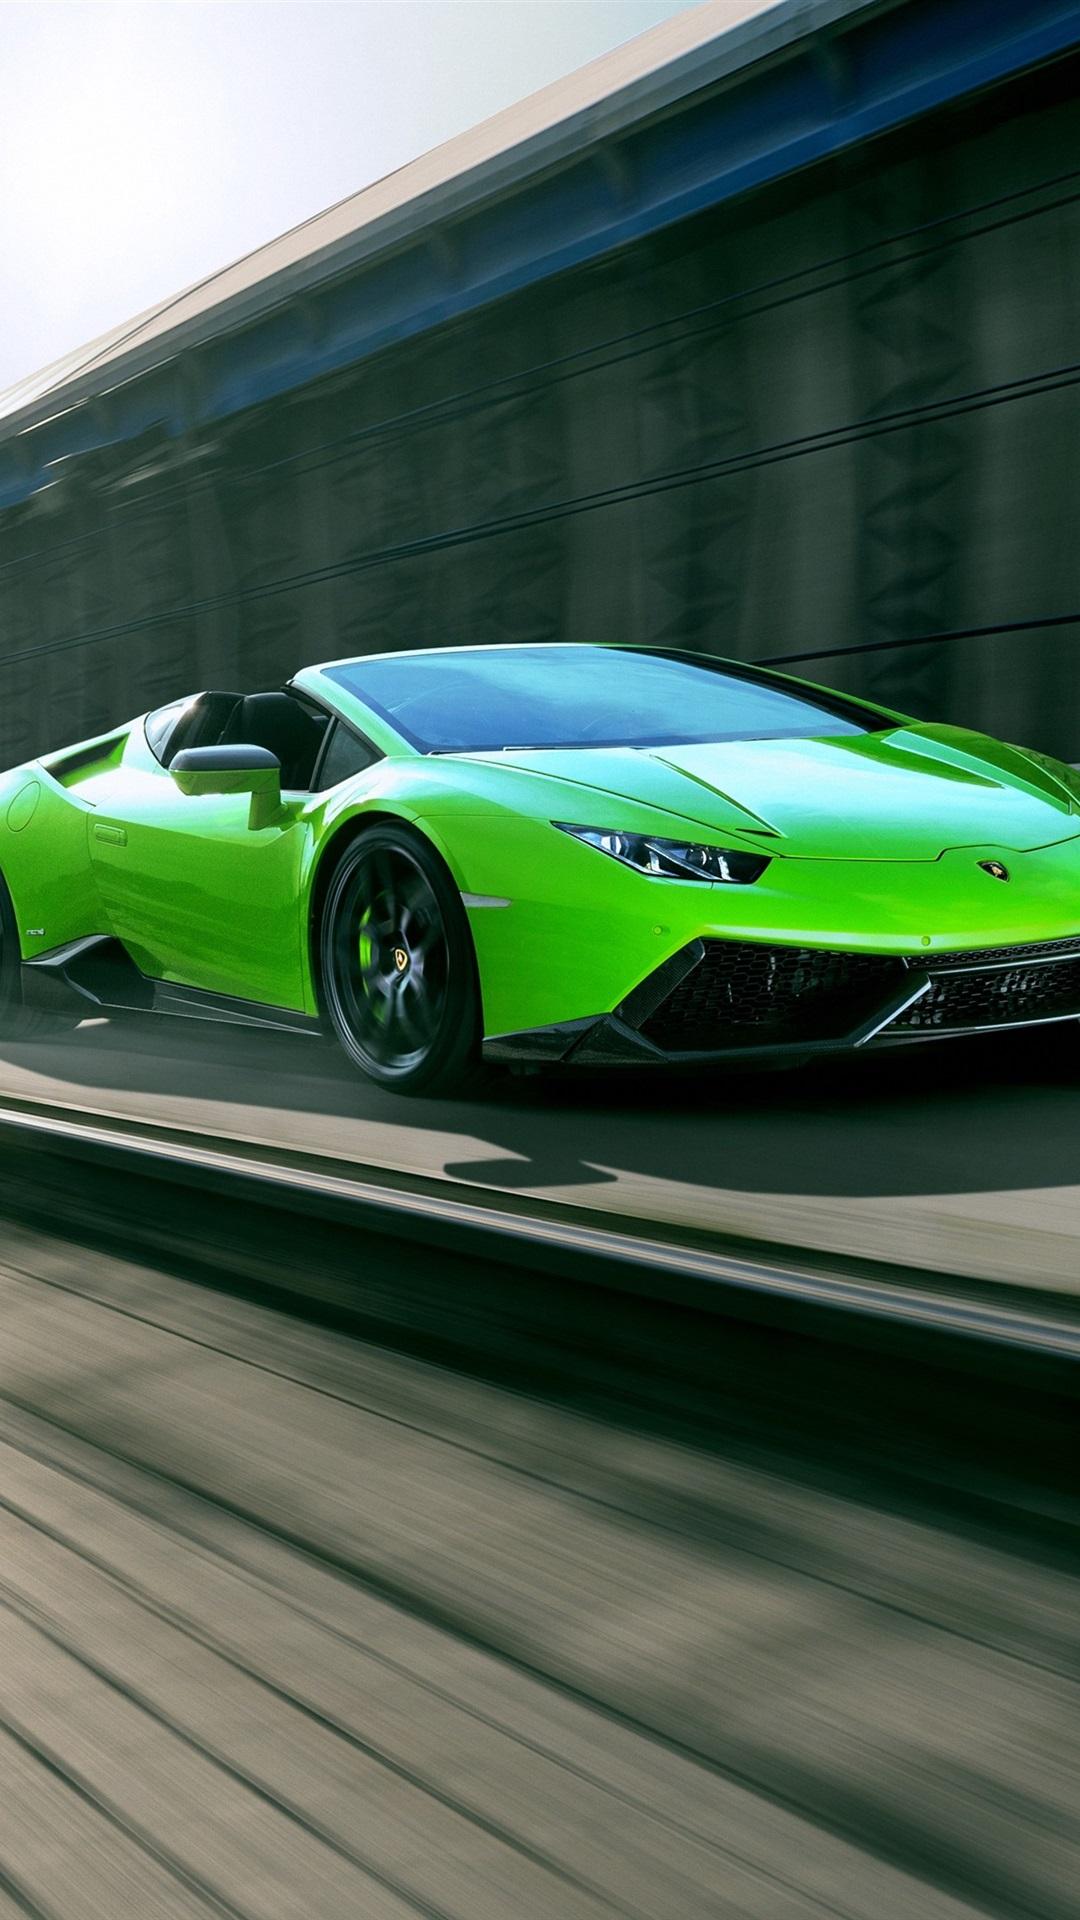 Lamborghini Huracan Spyder Green Supercar High Speed 1080x1920